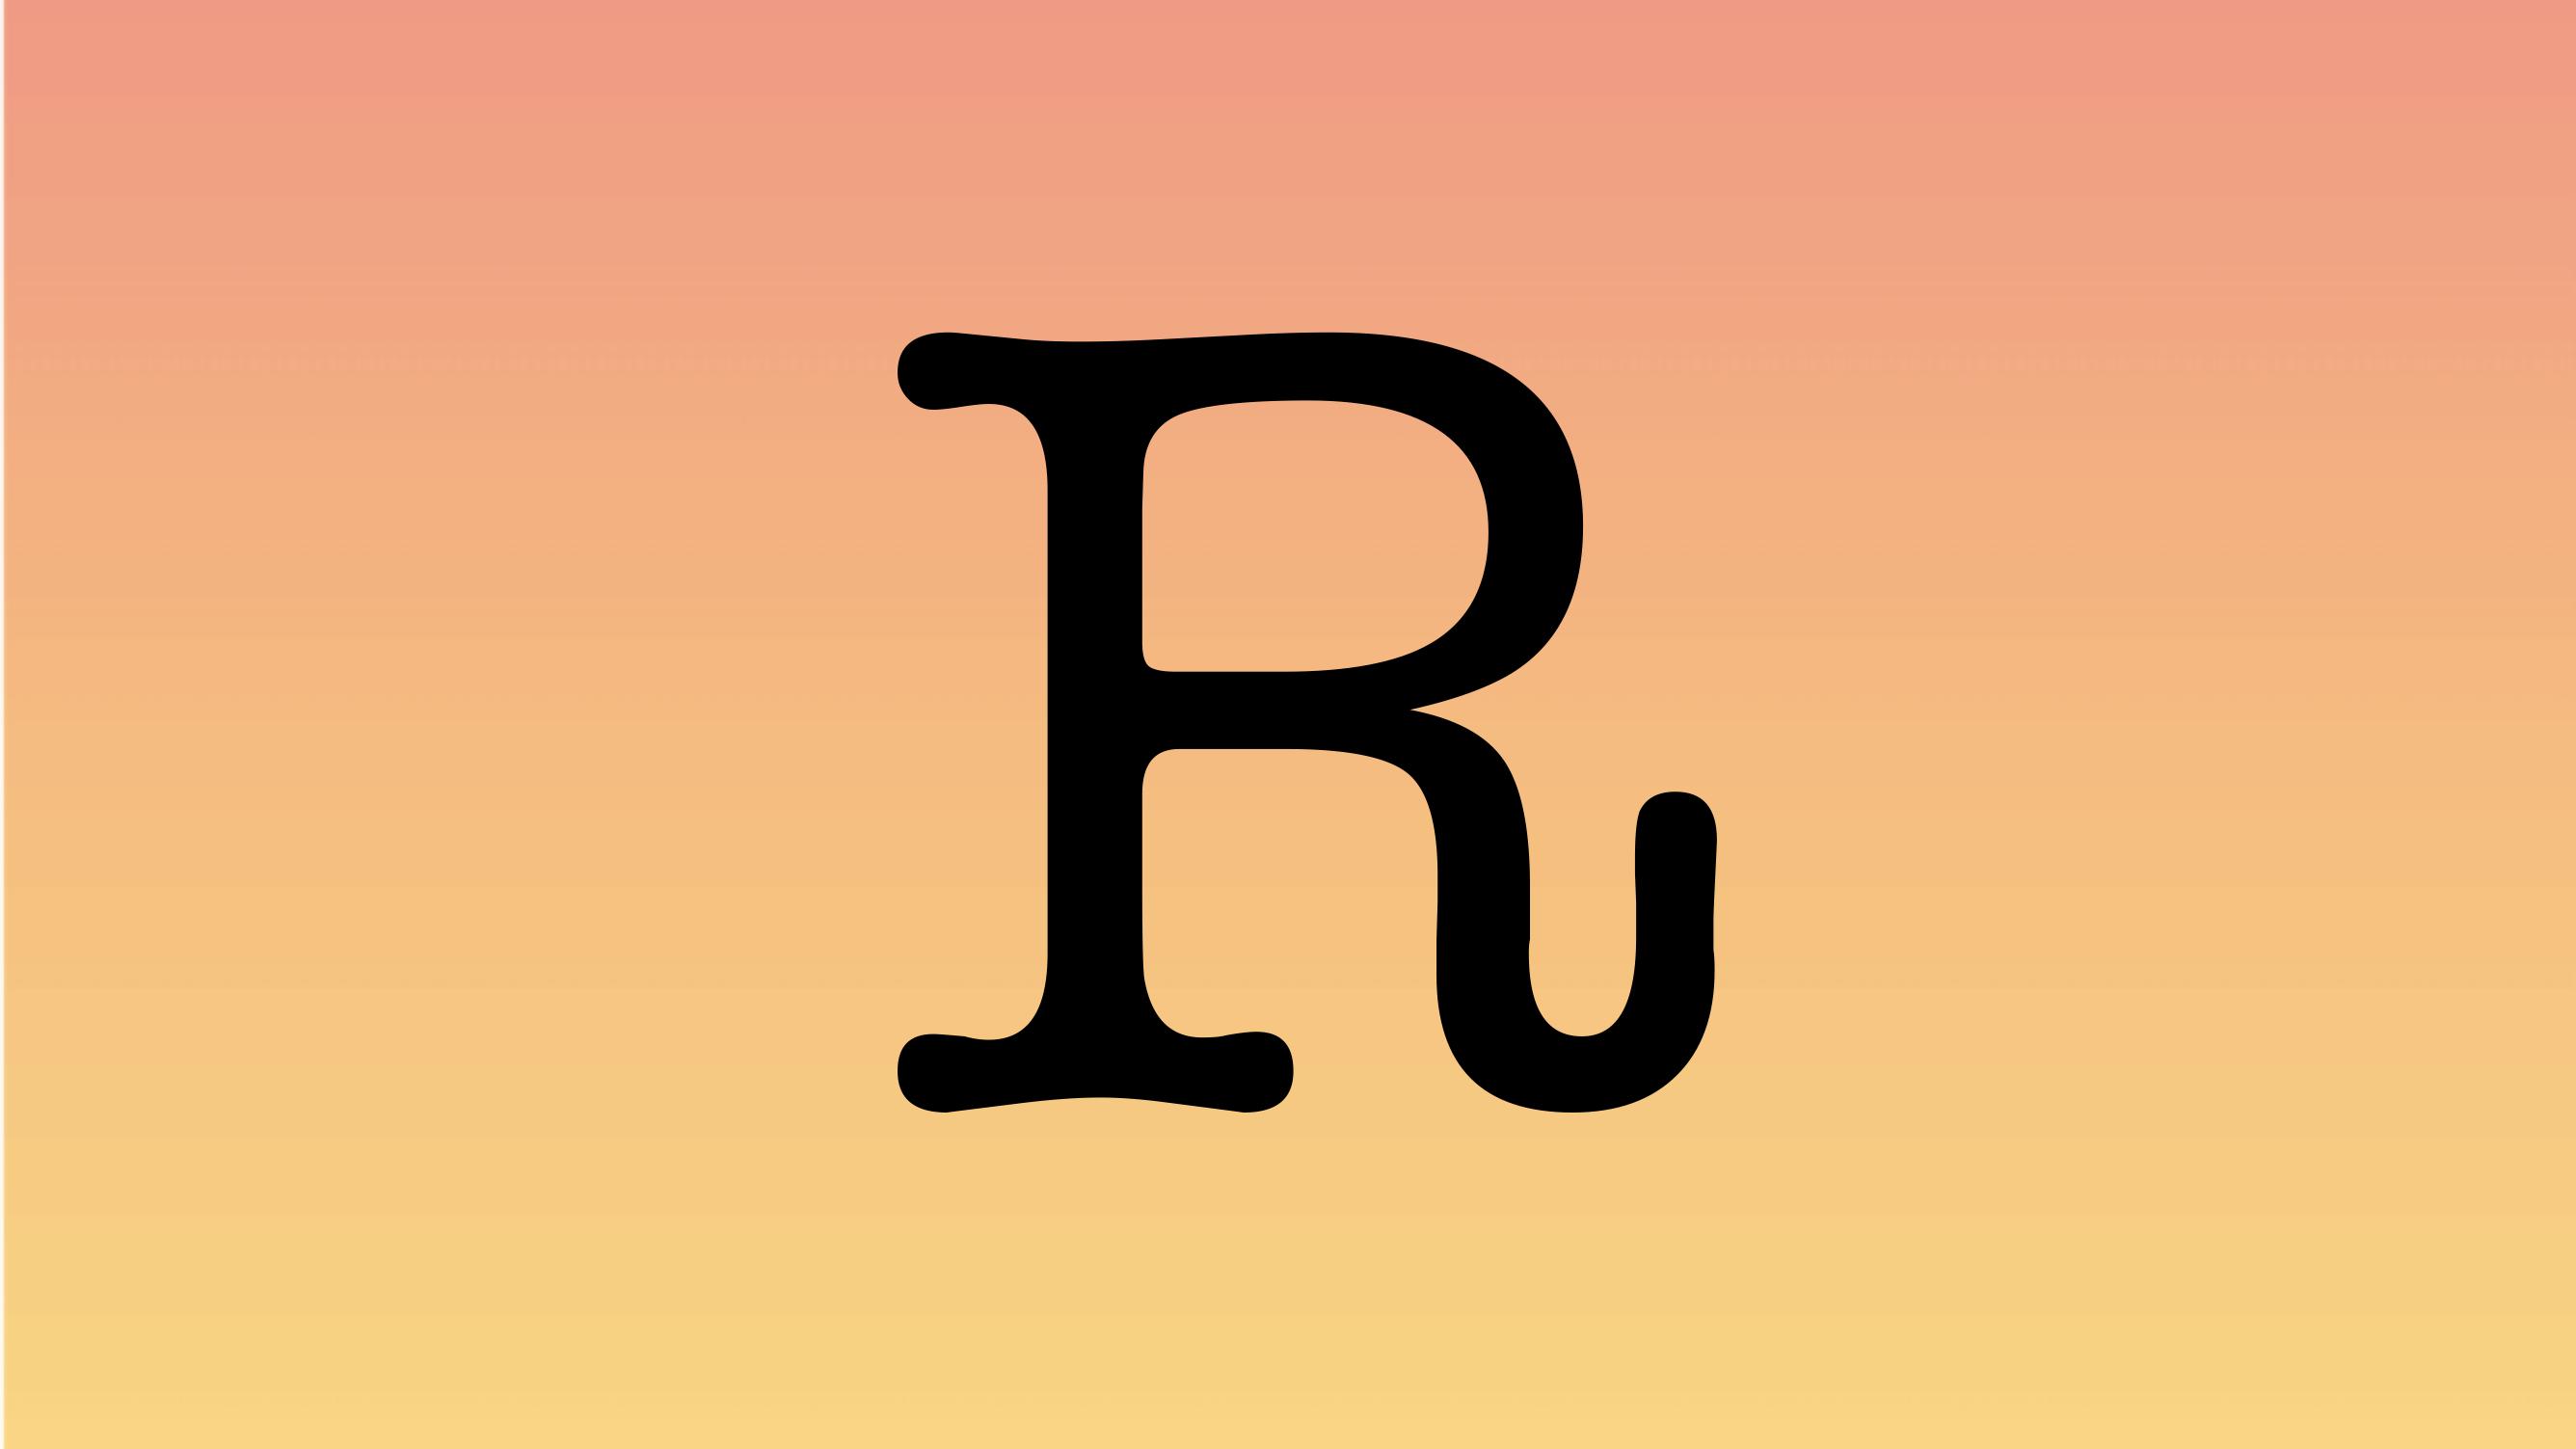 Rから始まる英語のサッカー用語【単語 & フレーズ】